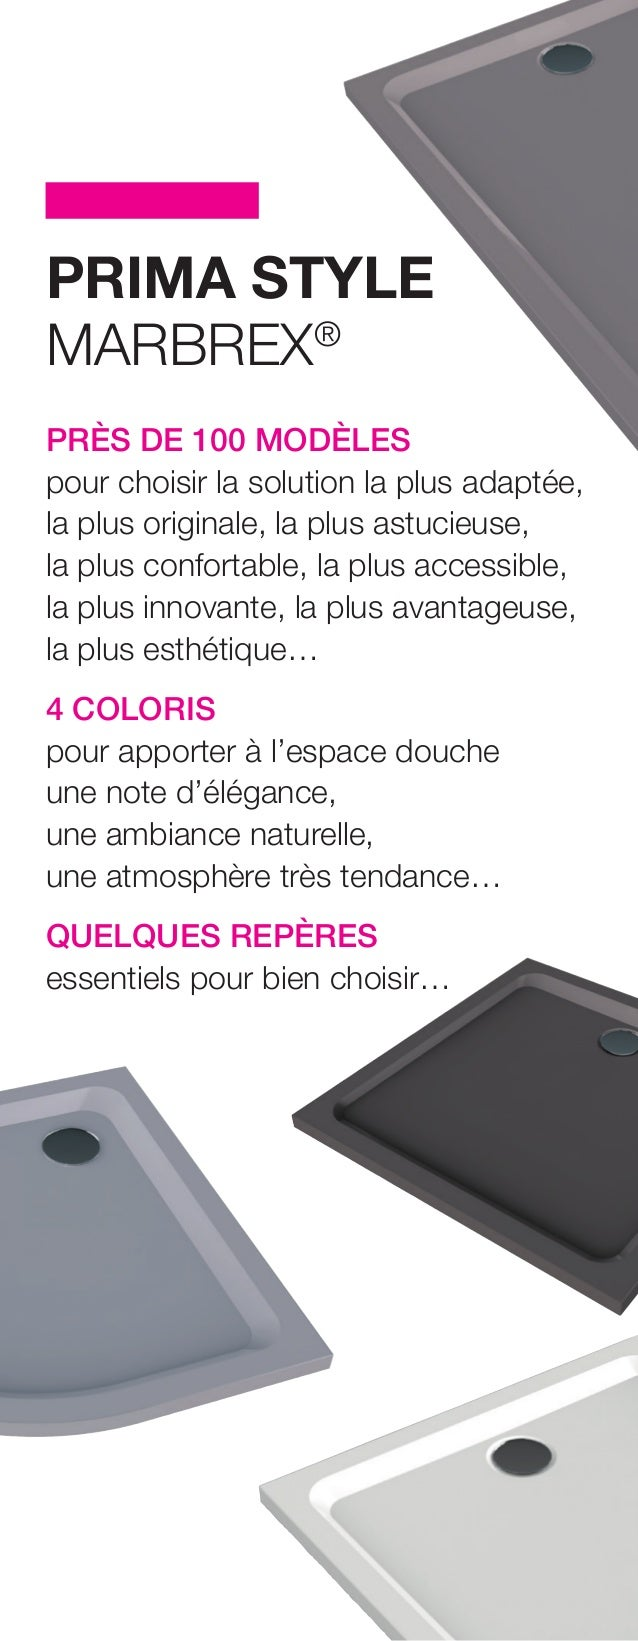 Dossier De Presse Receveurs Prima Style Marbrex Par Allia